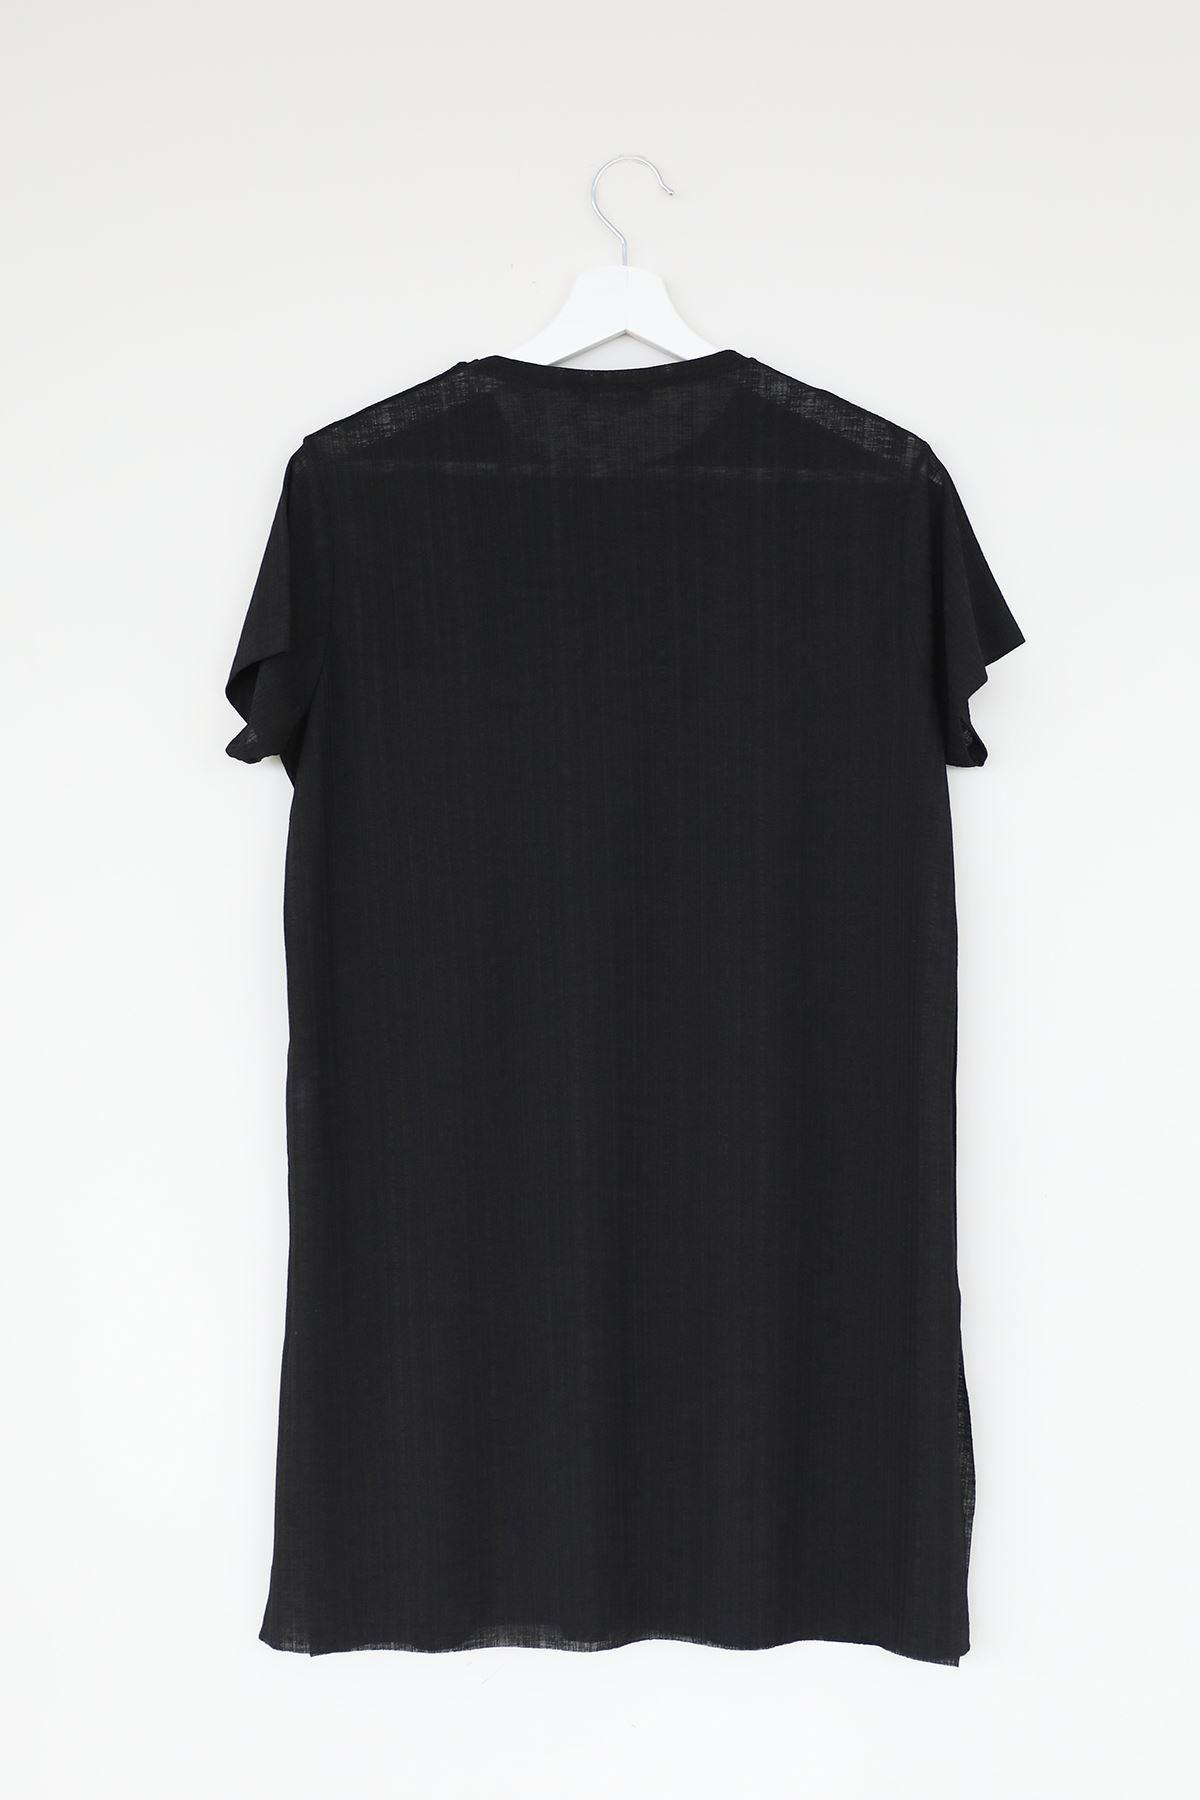 Dream Side Baskılı T-shirt-Siyah